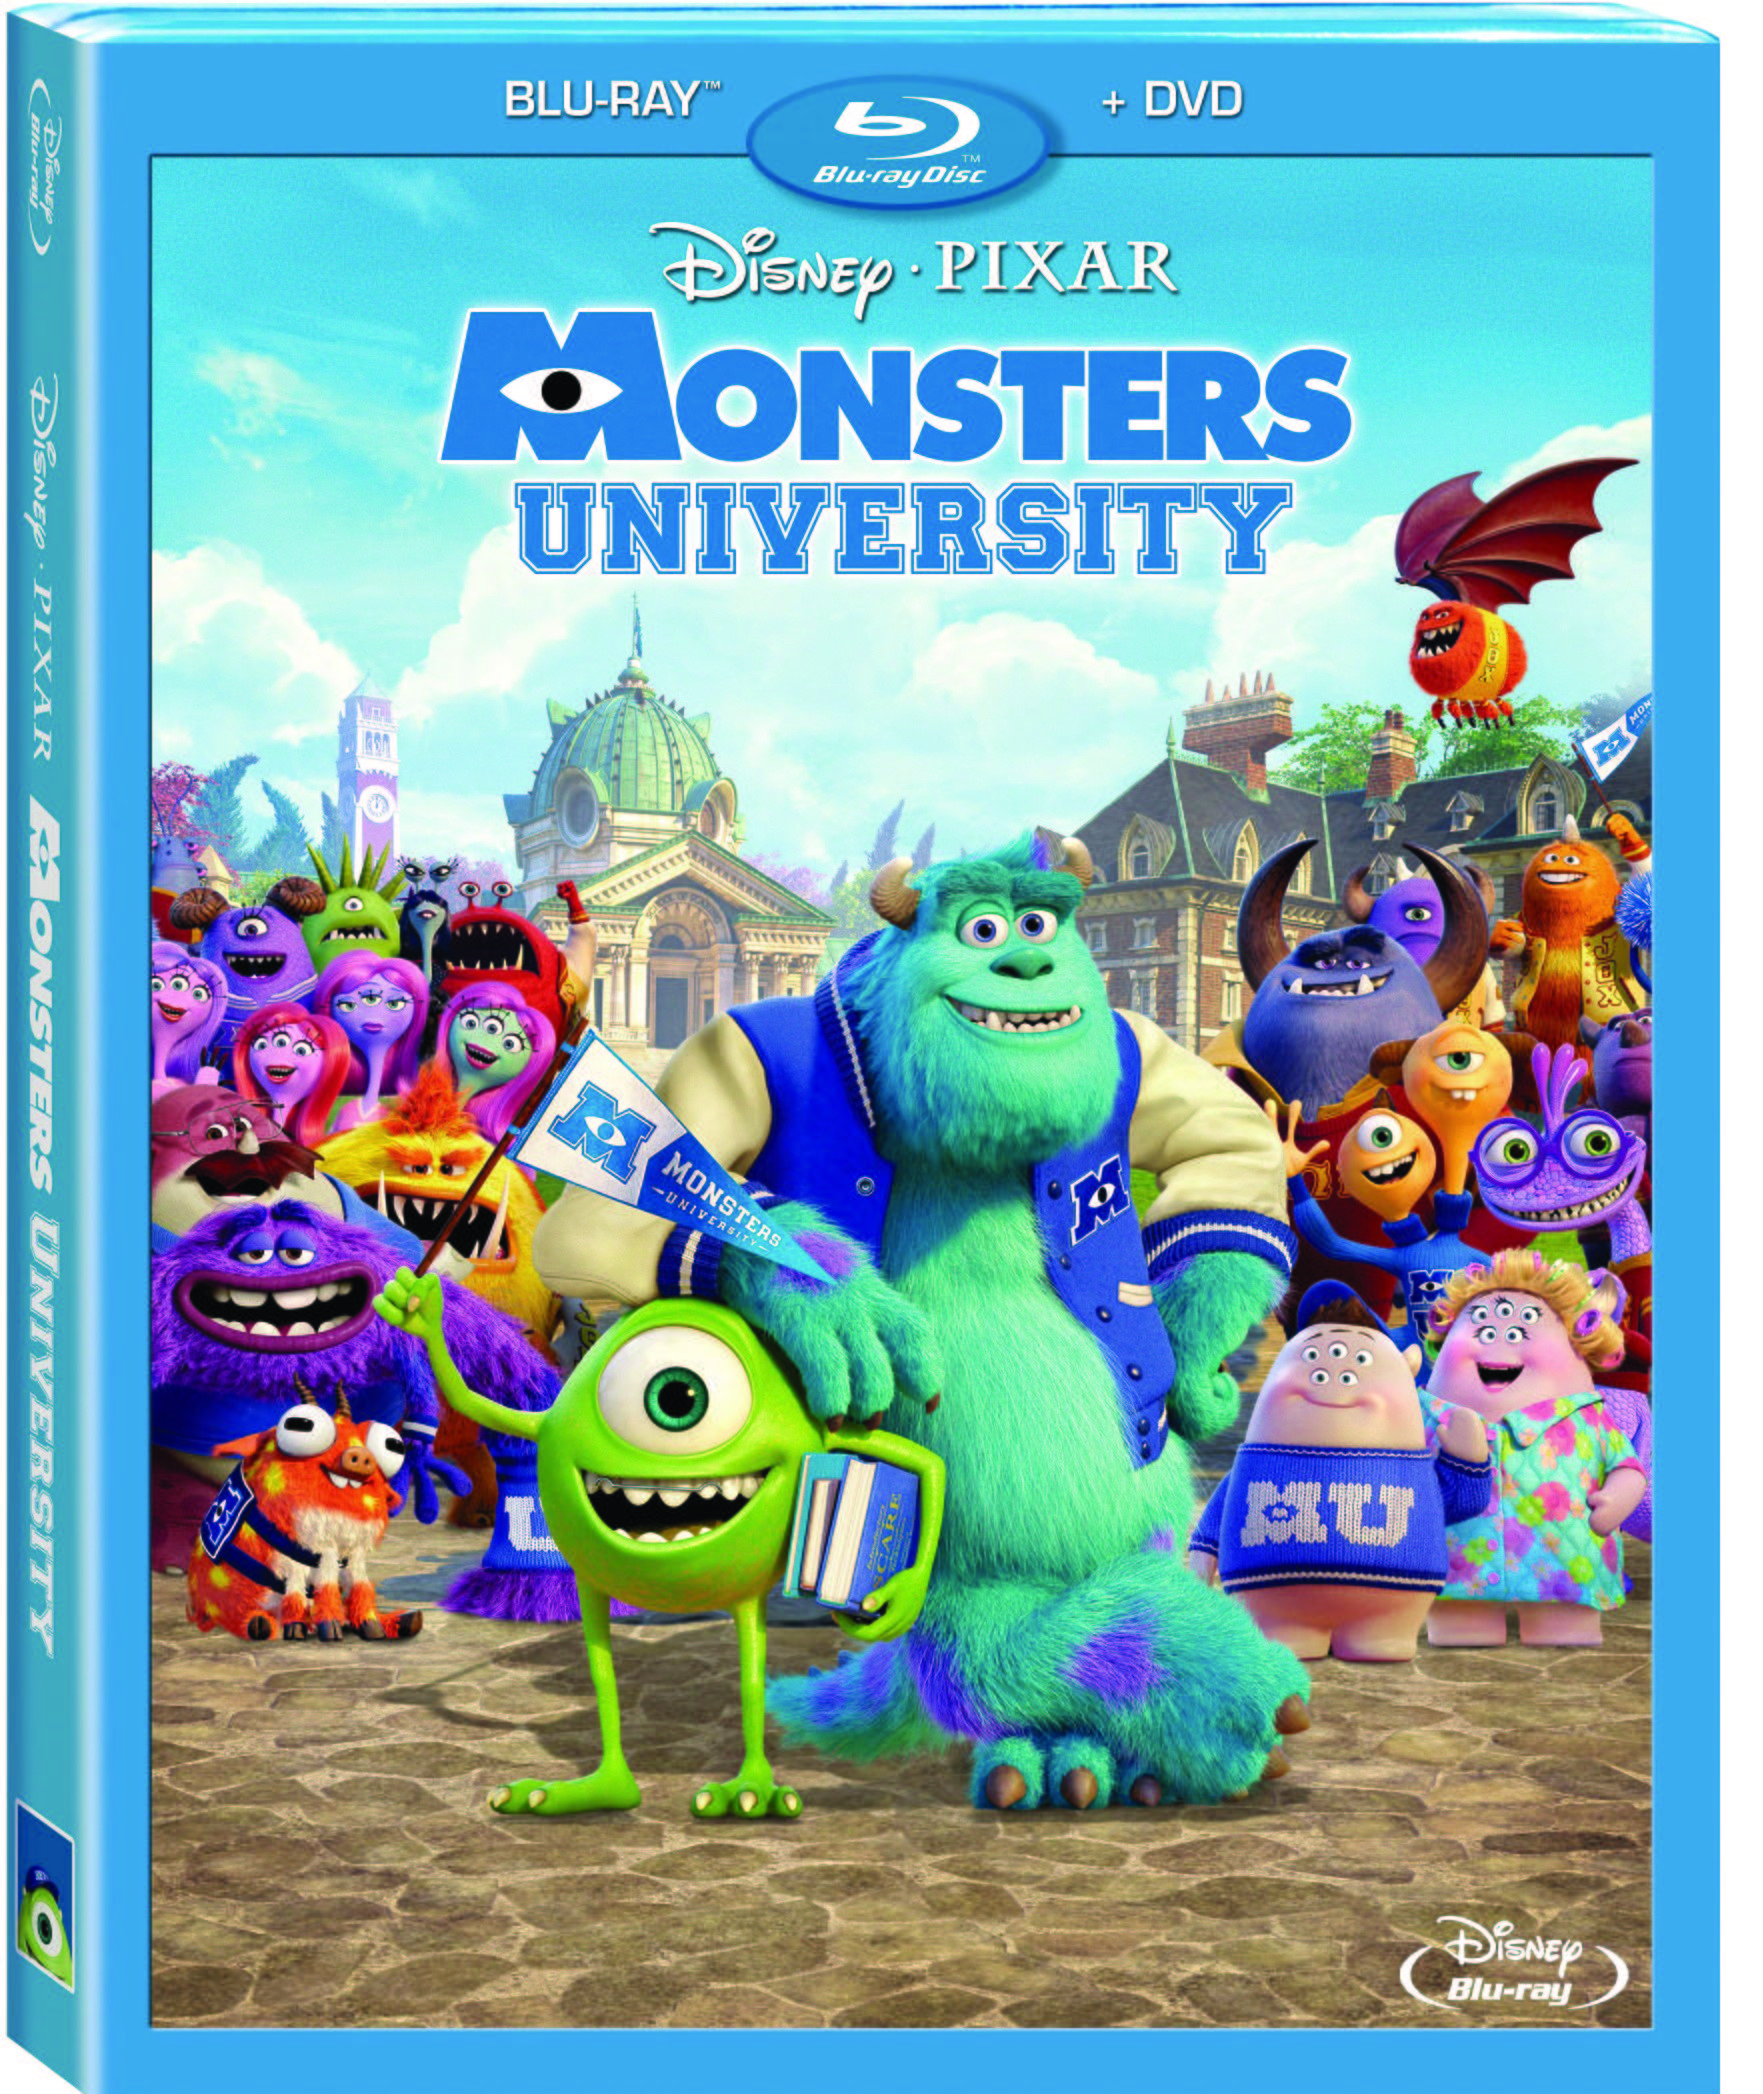 MonstersUniversityBlurayComboArt.jpg_cmyk